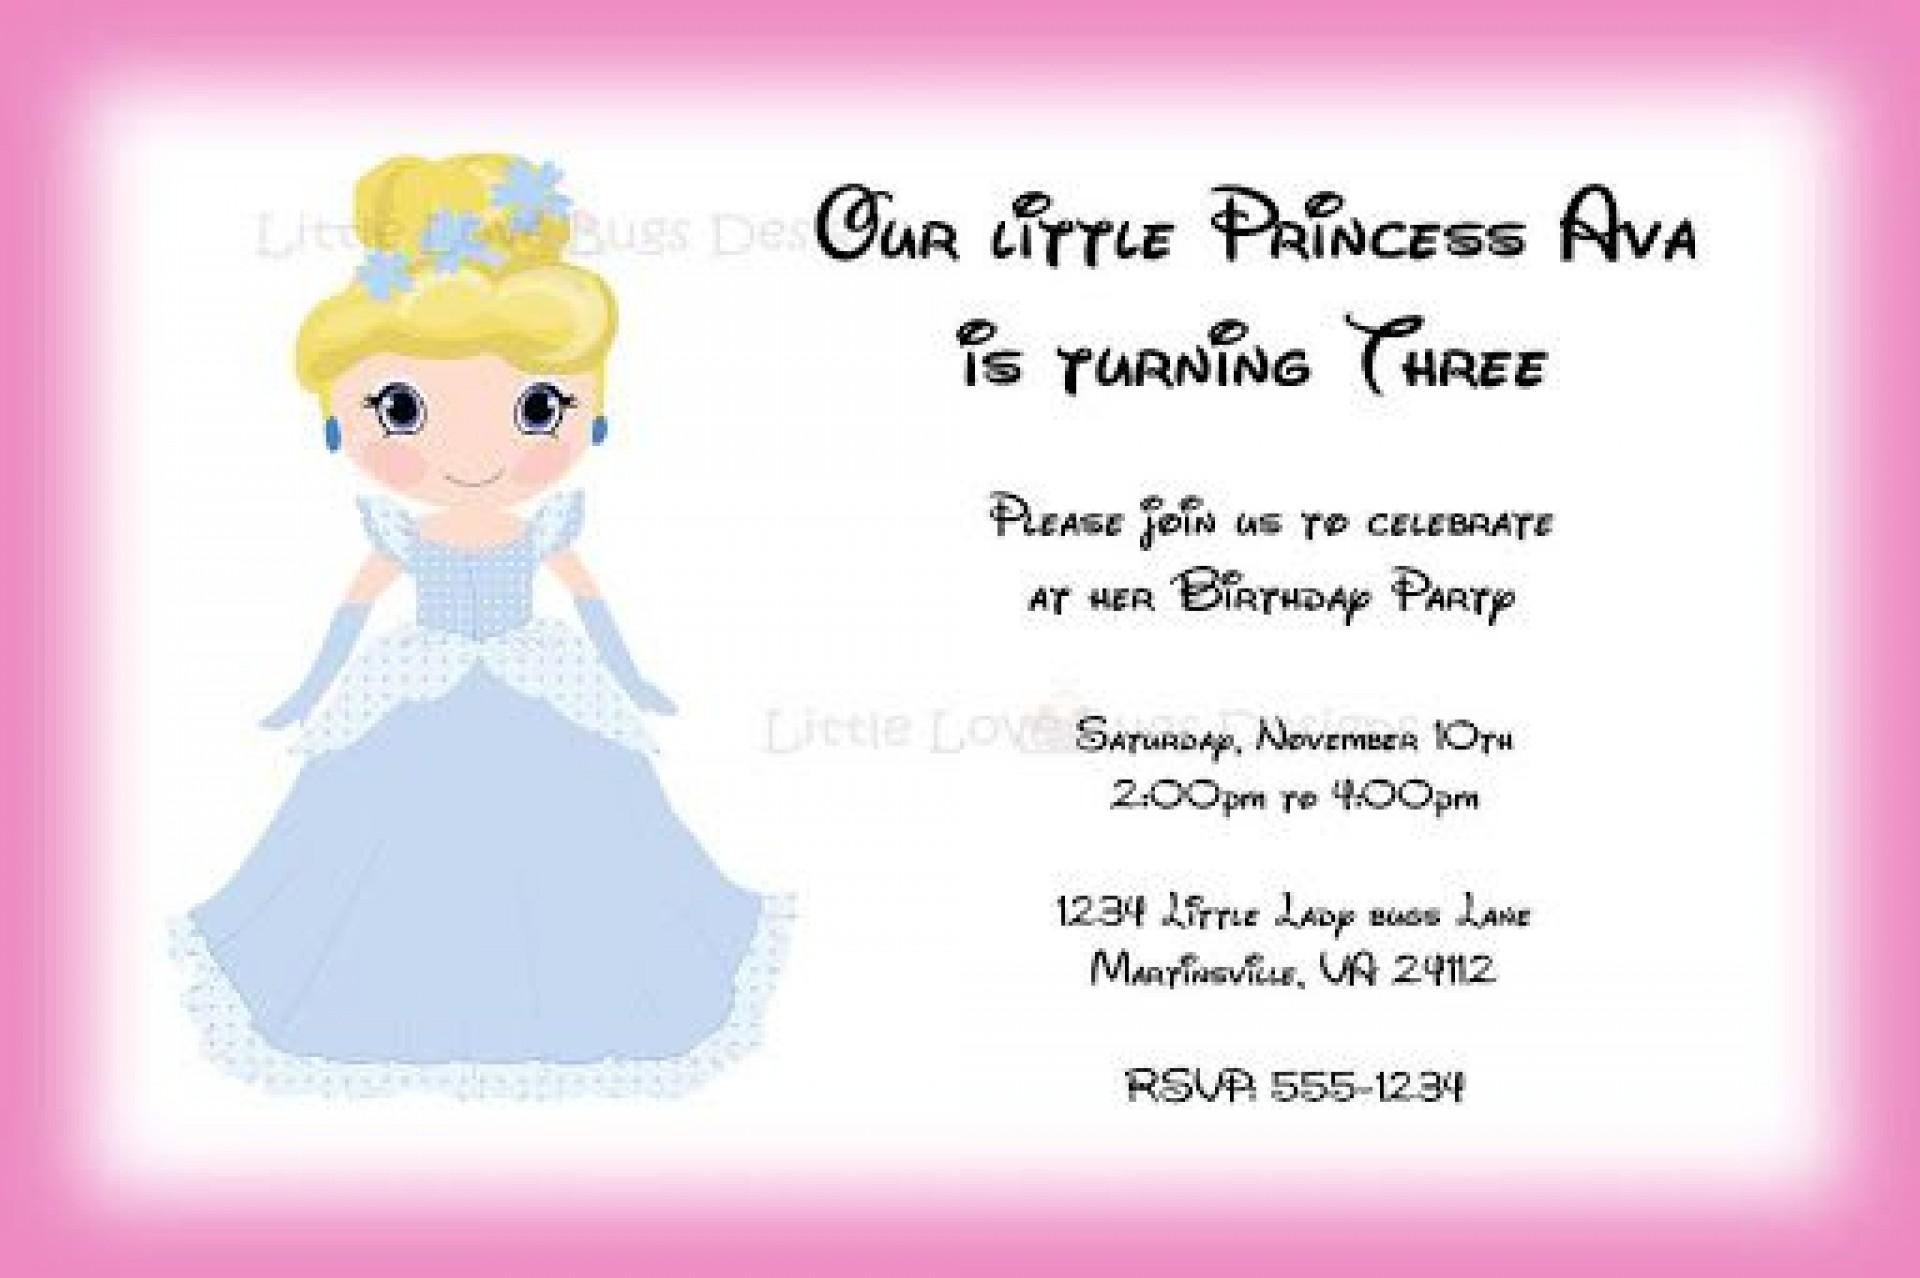 002 Surprising Free Online Birthday Invitation Maker Printable Highest Quality  1st Card1920